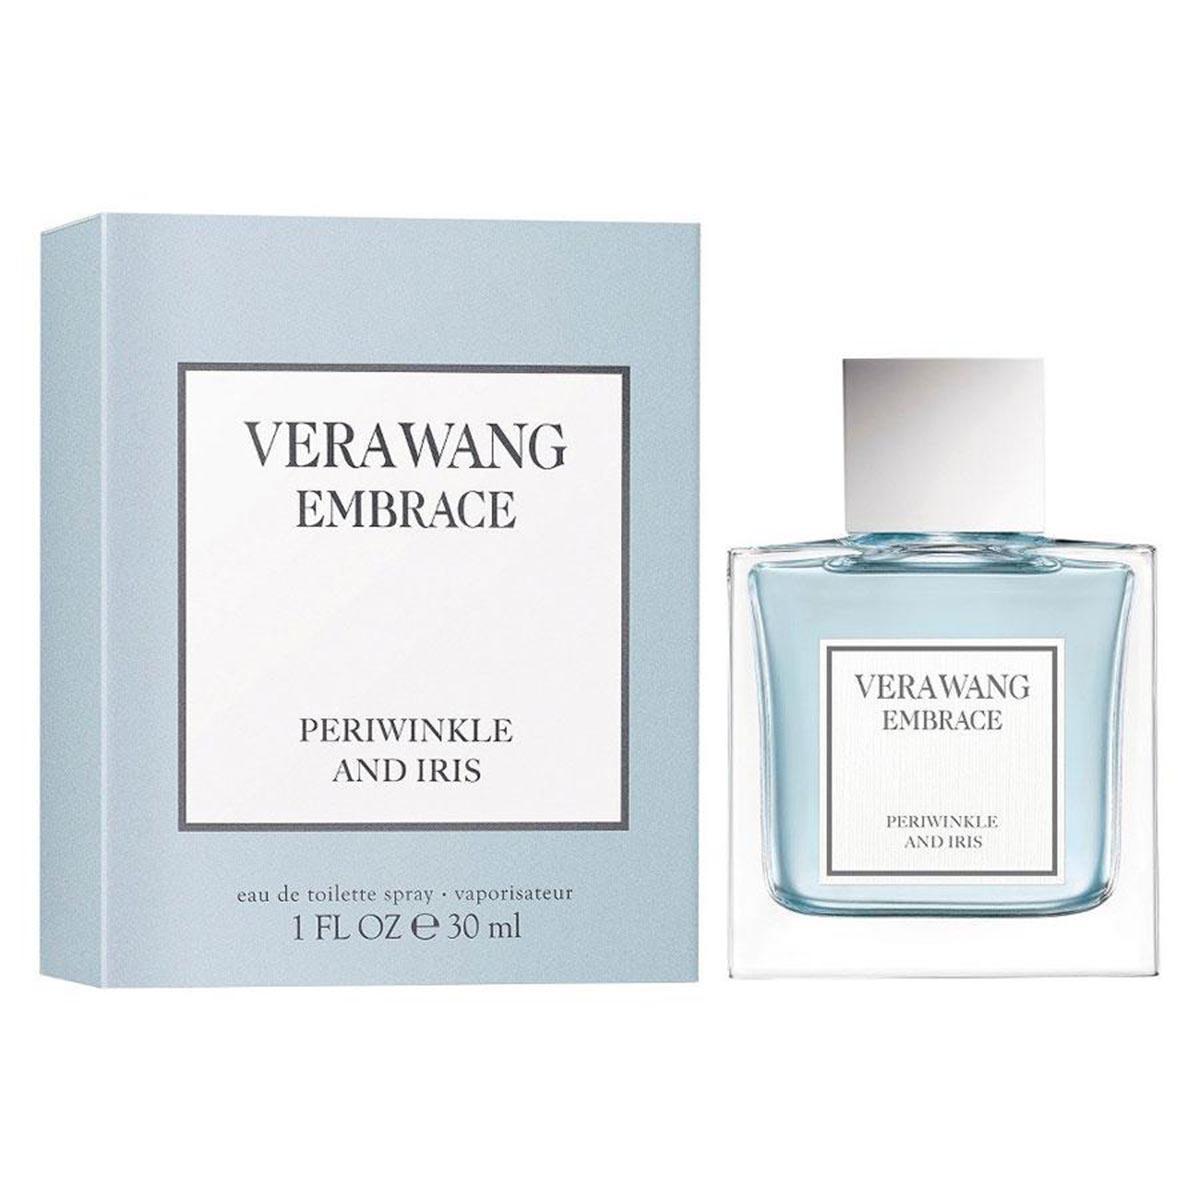 Vera wang embrace periwinkle and iris eau de toilette 30ml vaporizador